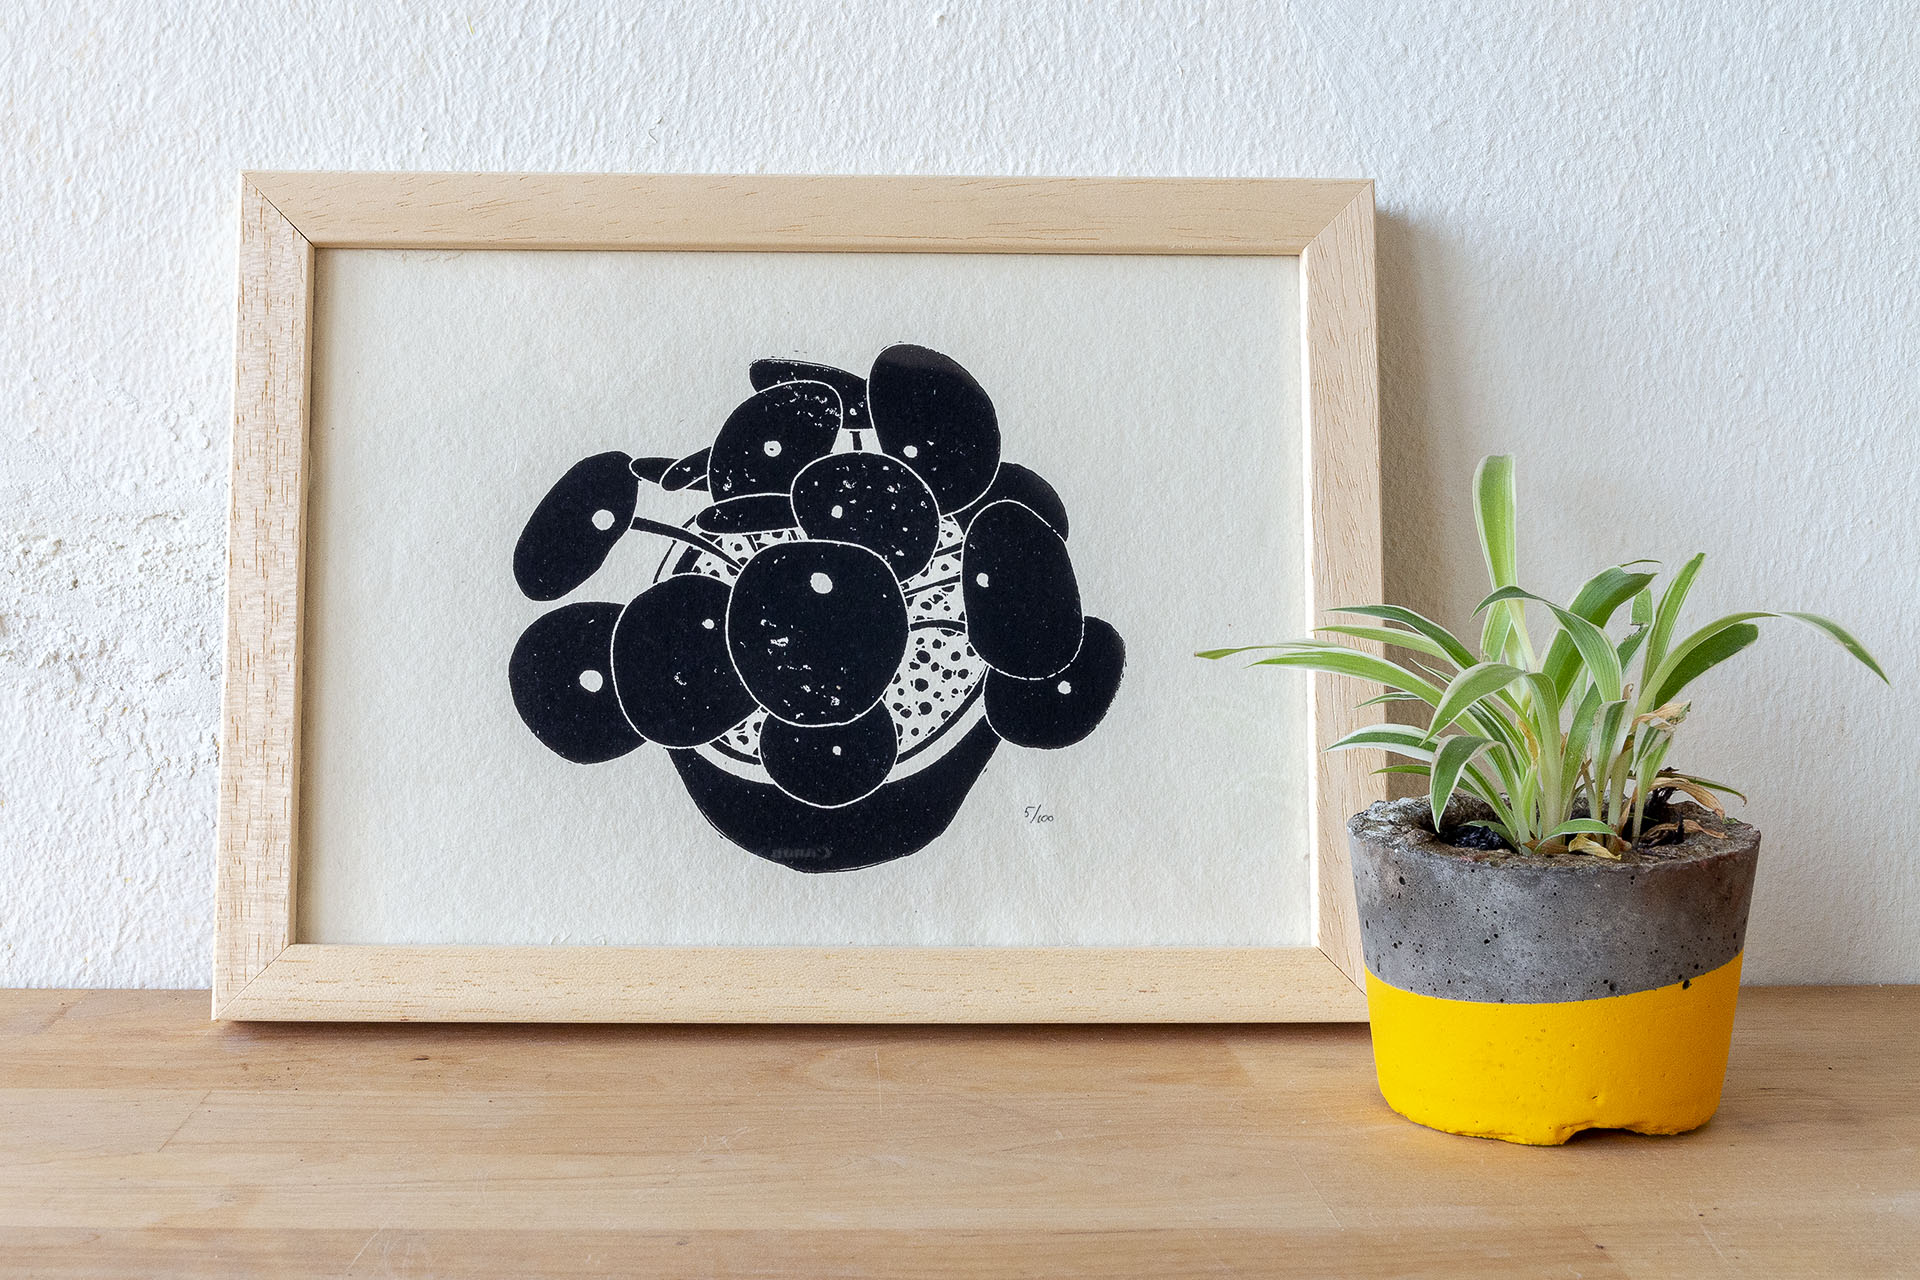 Linosnede pannekoekenplant